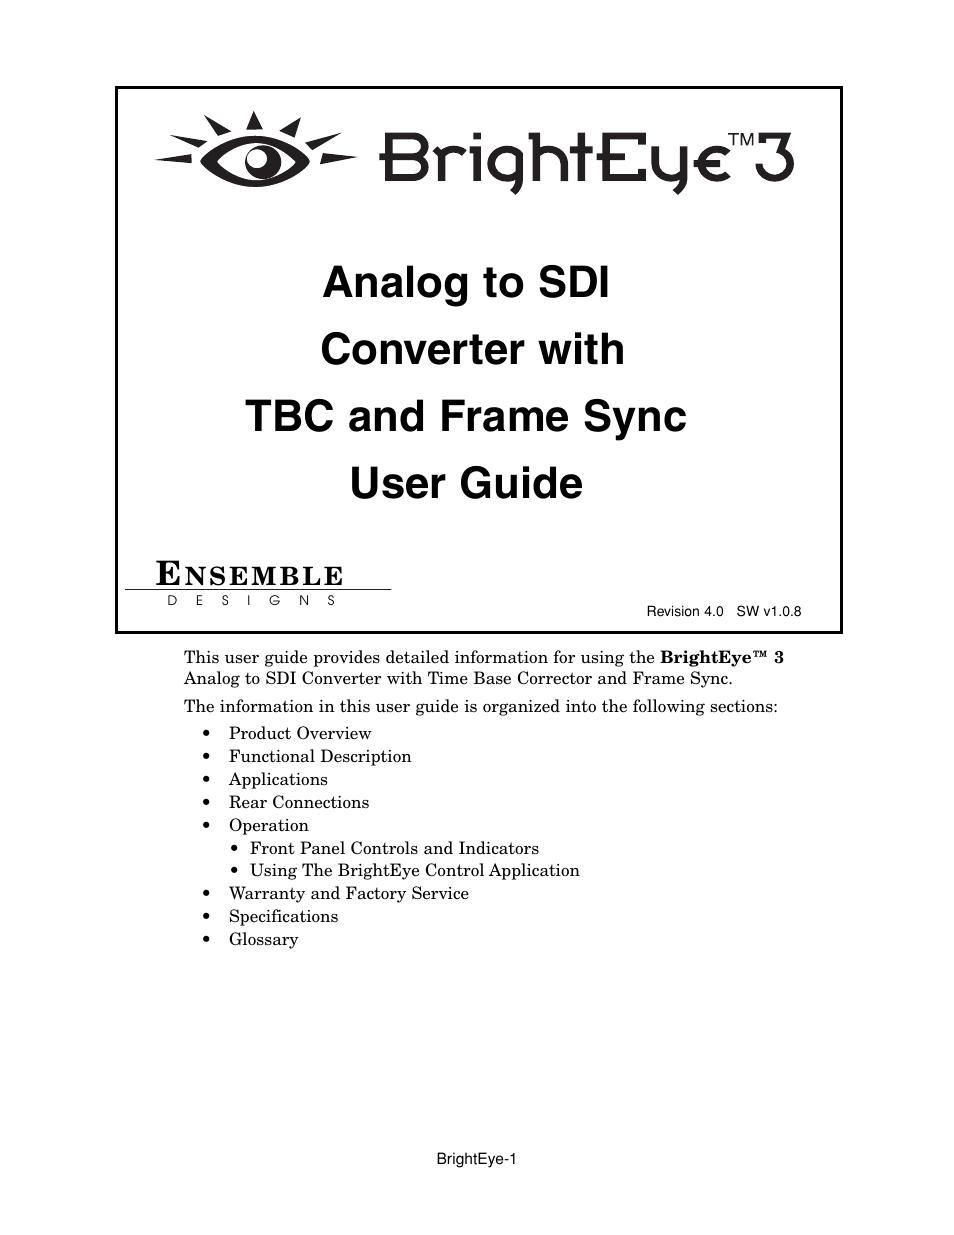 Ensemble Designs BrightEye 3 Analog to SDI Converter with TBC and ...